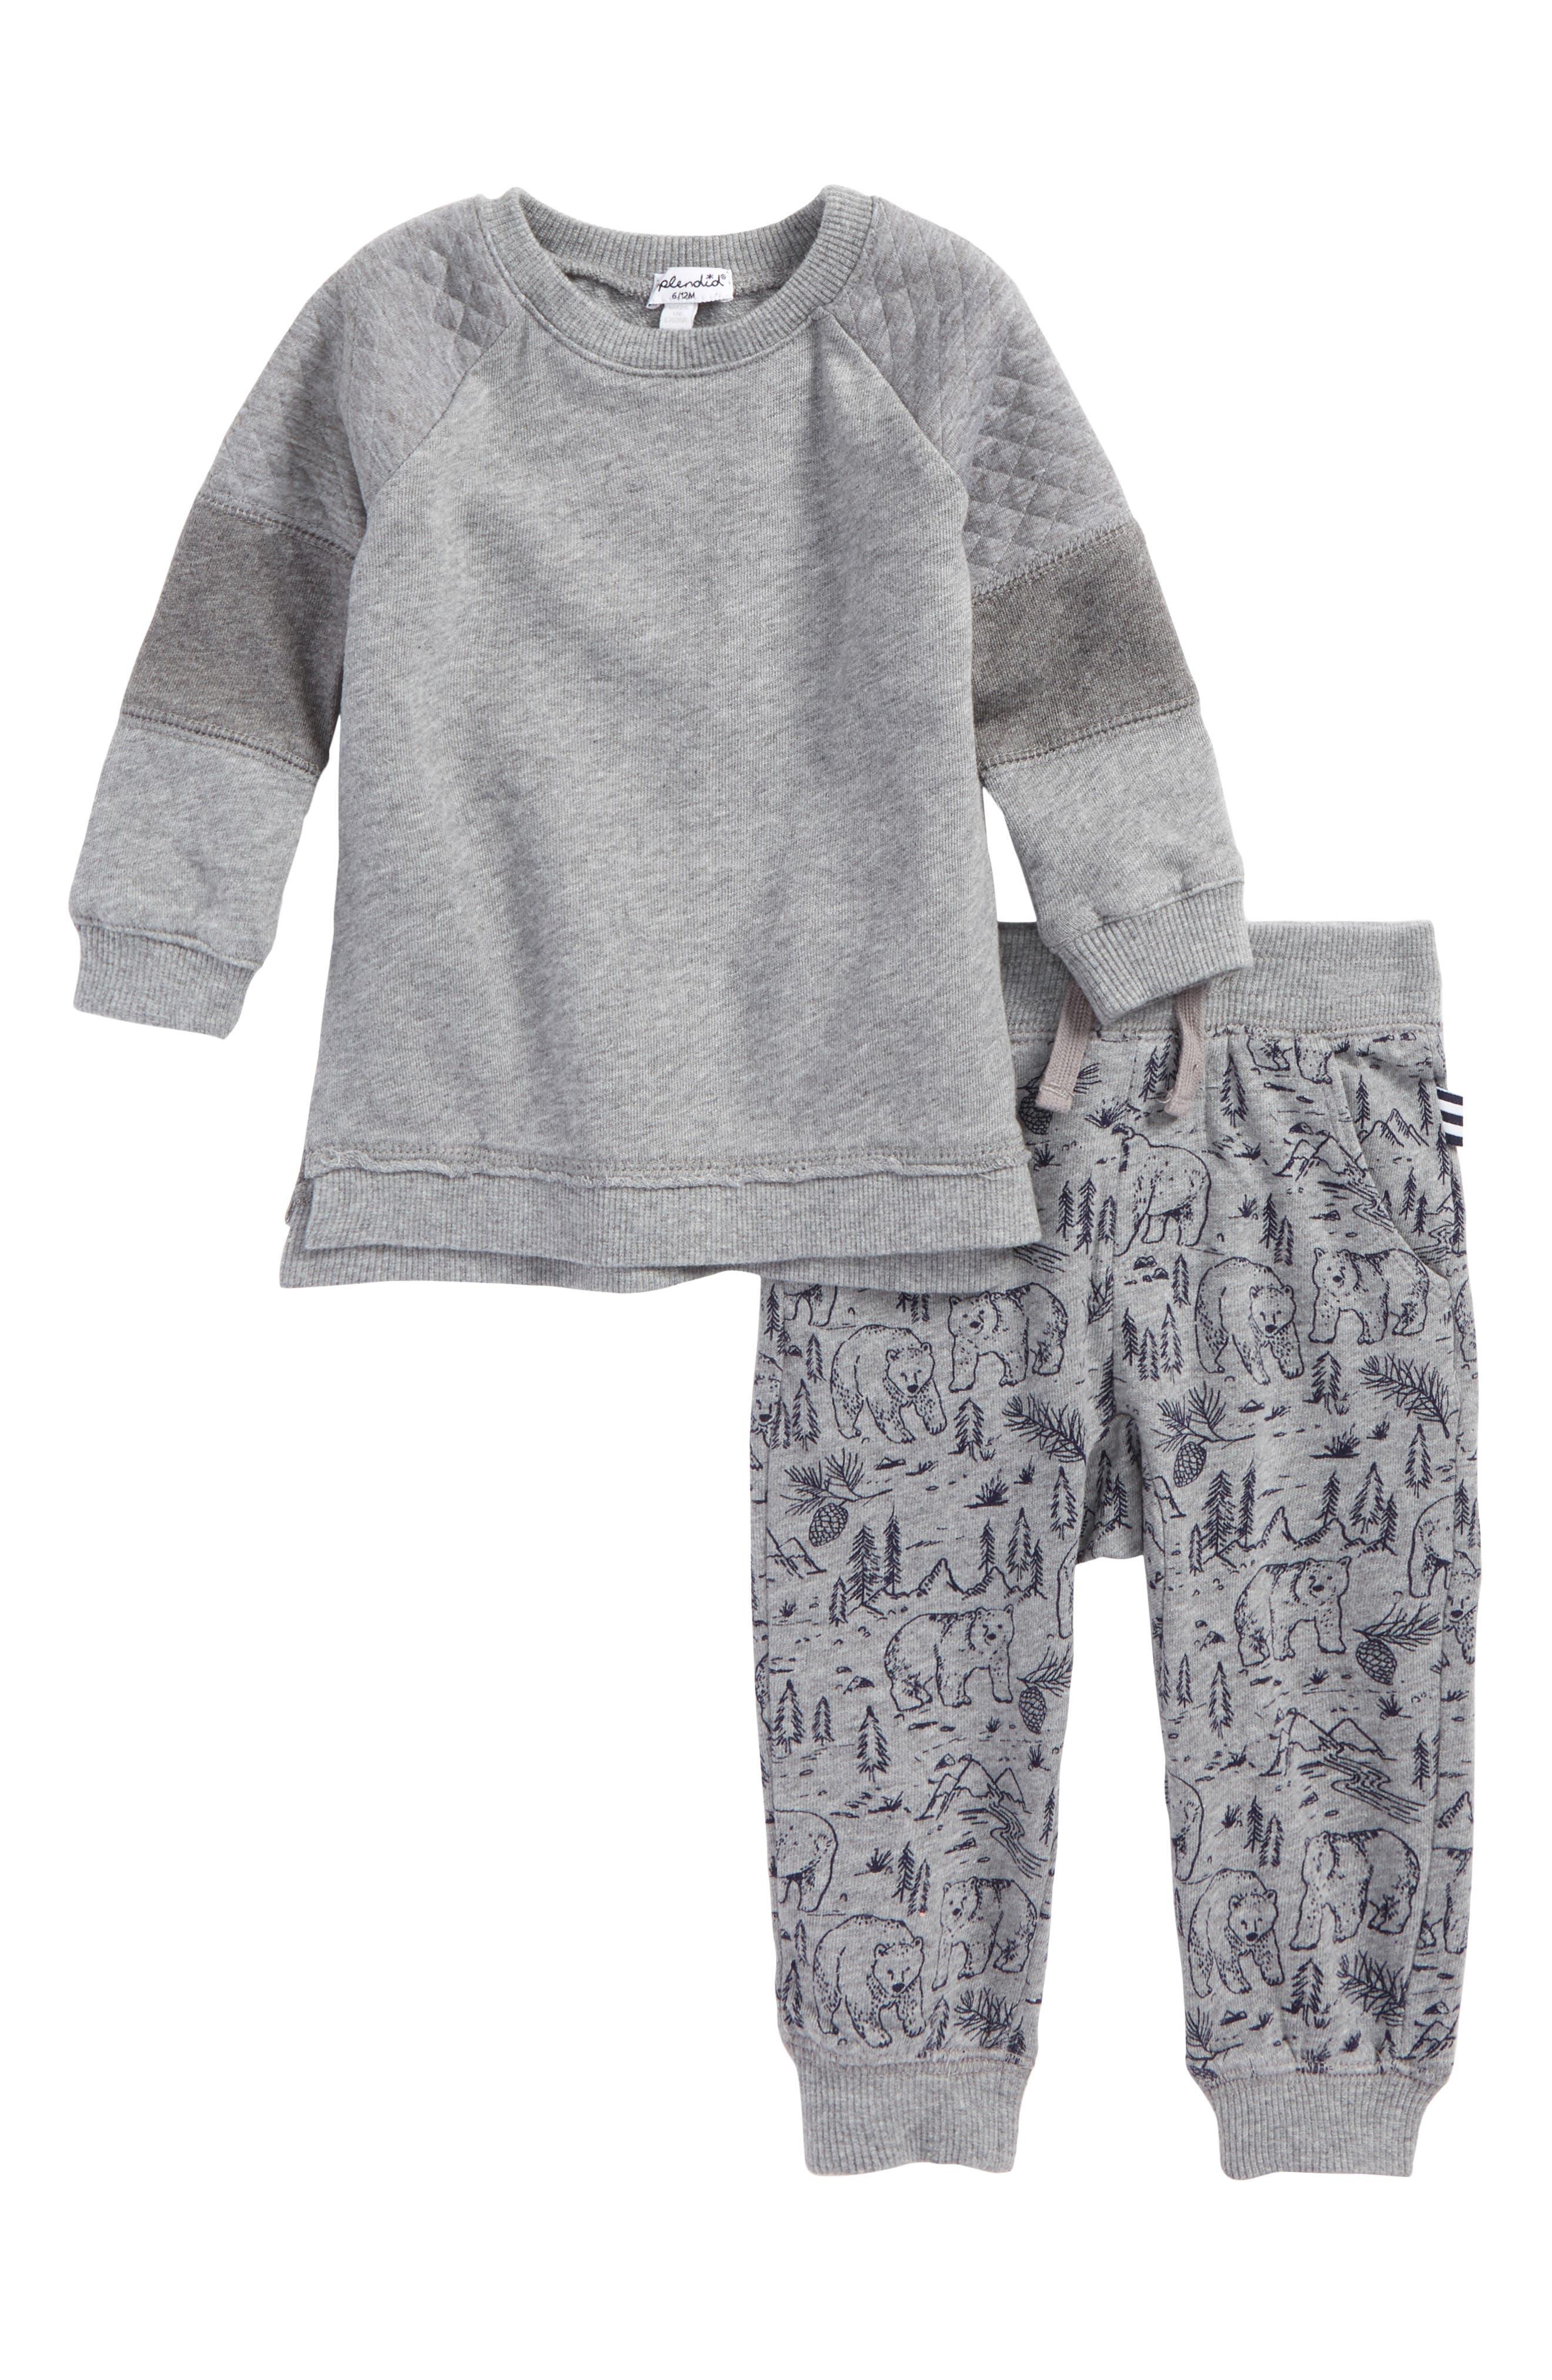 Alternate Image 1 Selected - Splendid Sweatshirt & Sweatpants Set (Baby Boys)